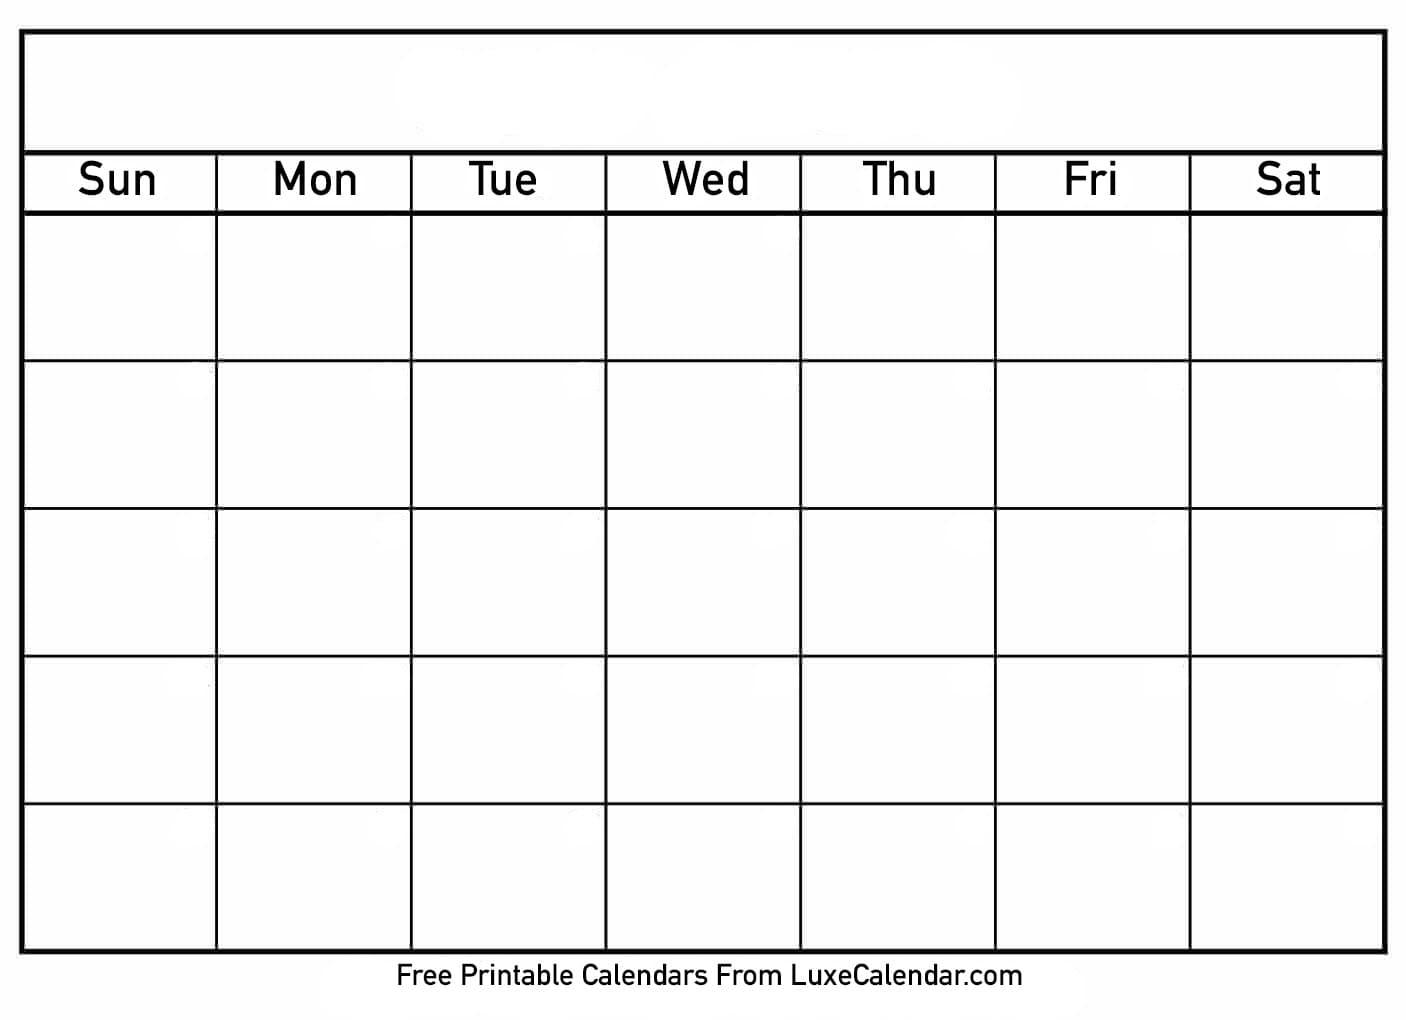 Blank Printable Calendar - Luxe Calendar for Fill In Printable Monthly Calendar